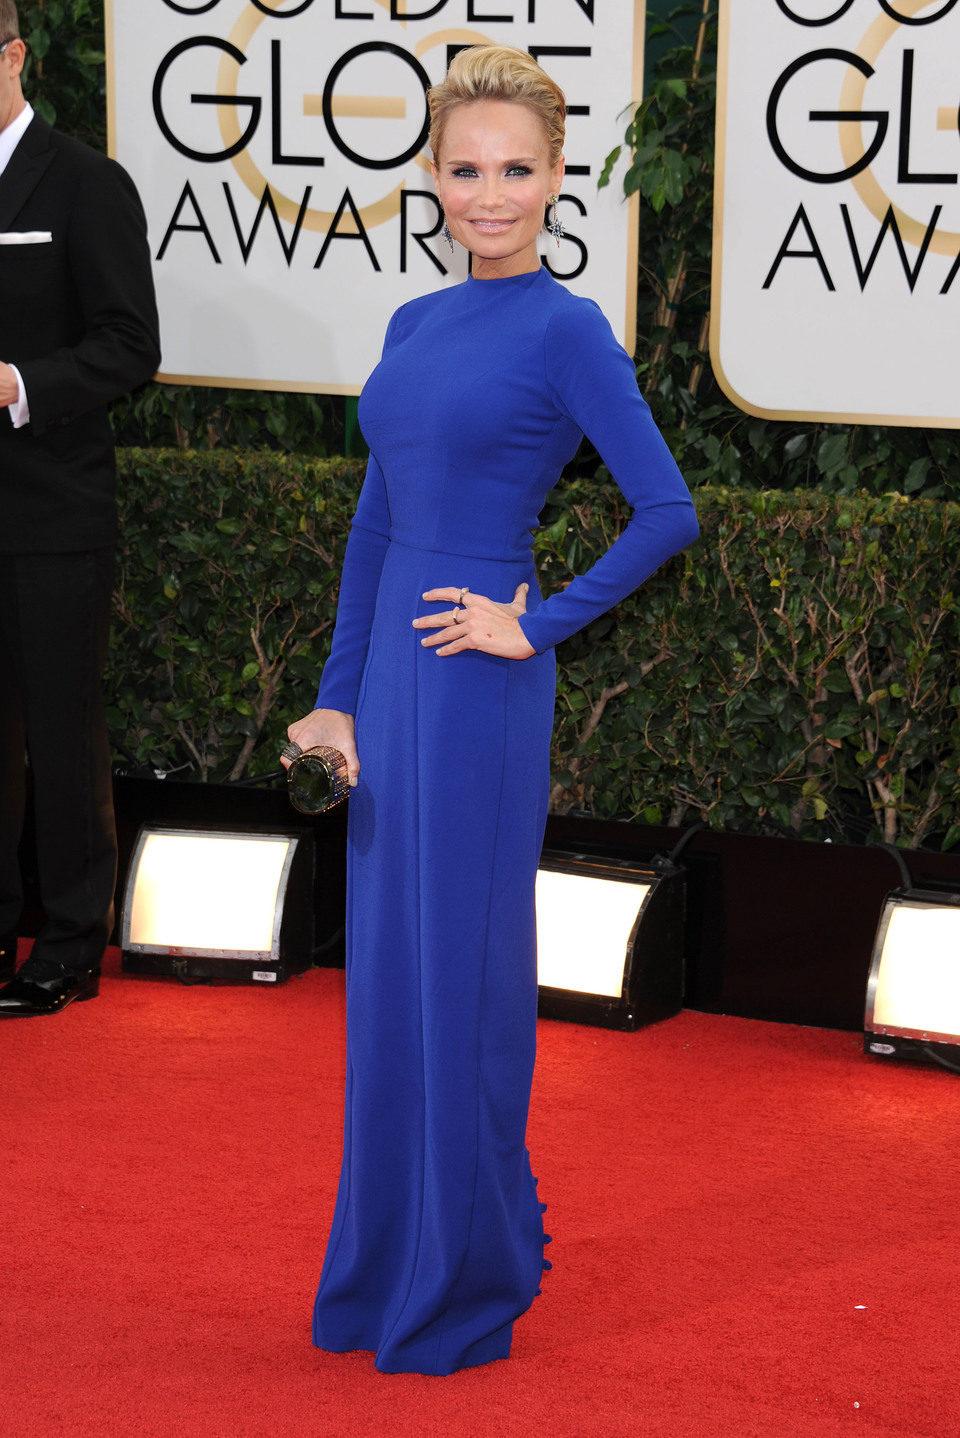 Kristin Chenoweth en los Globos de Oro 2014